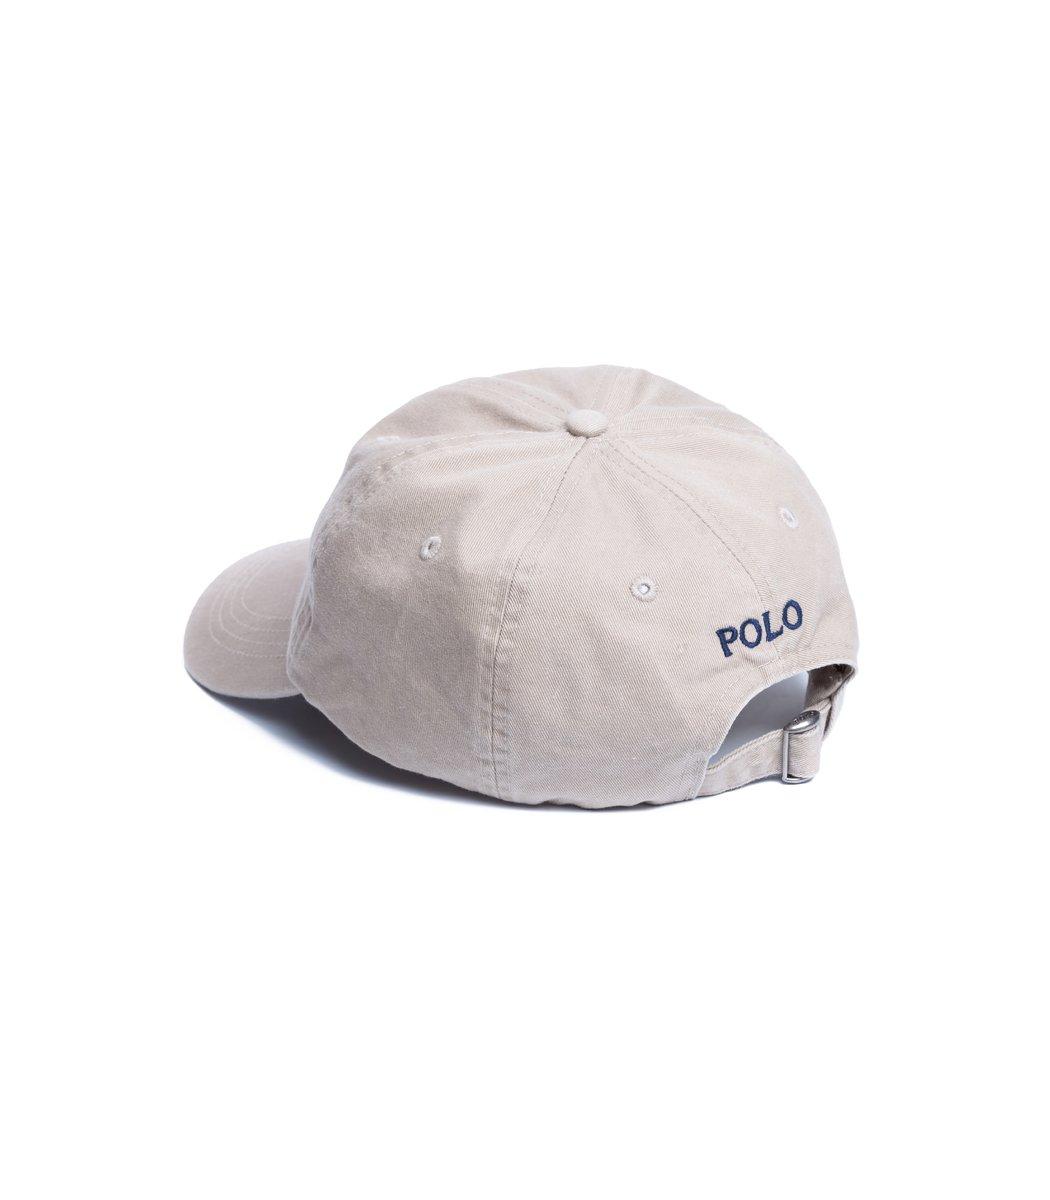 Кепка POLO Ralph Lauren Small logo Бежевый/синий